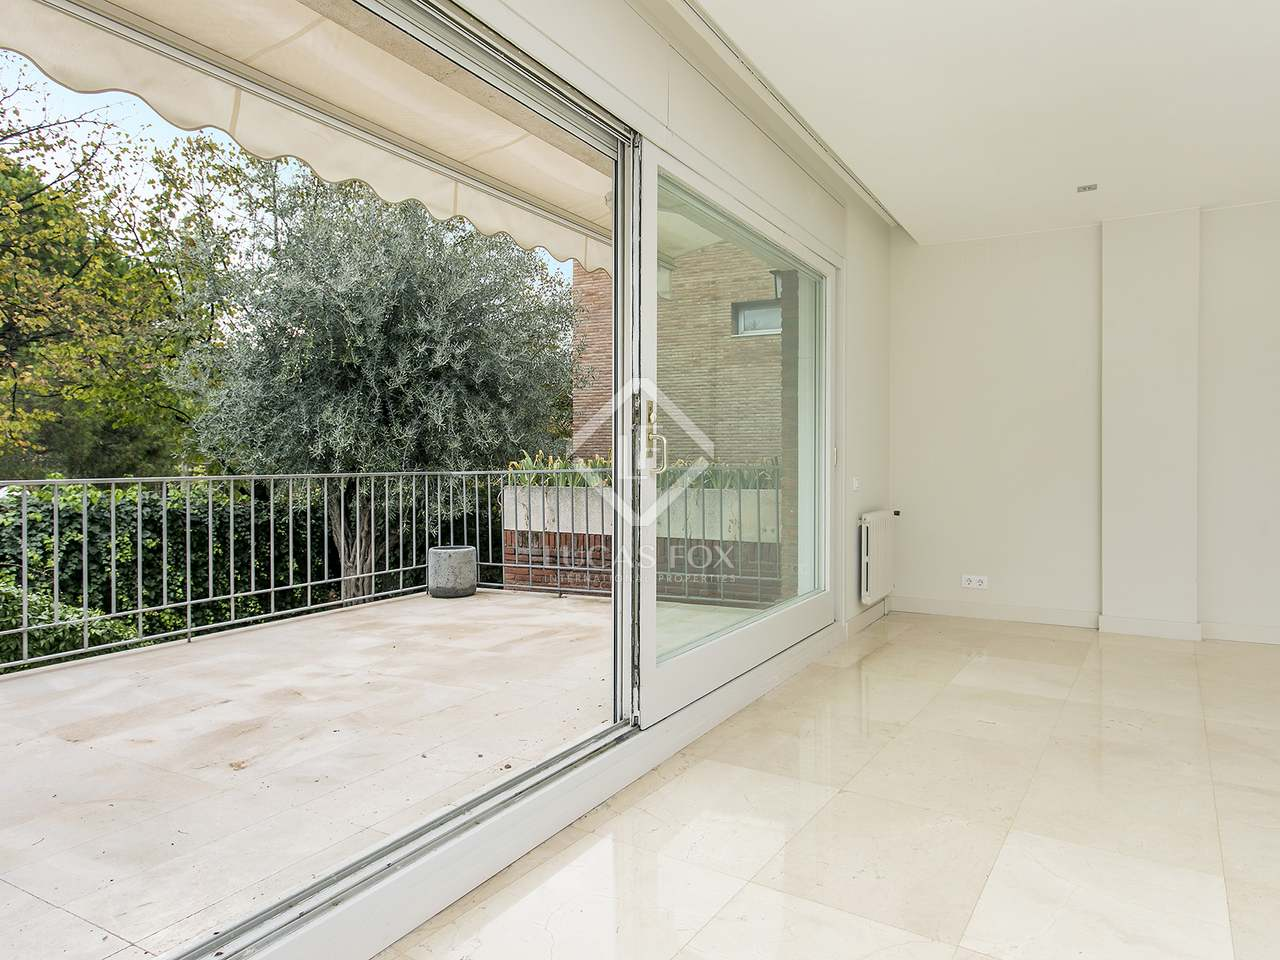 Casa de 390 m con jard n en alquiler en pedralbes for Casa con jardin alquiler barcelona